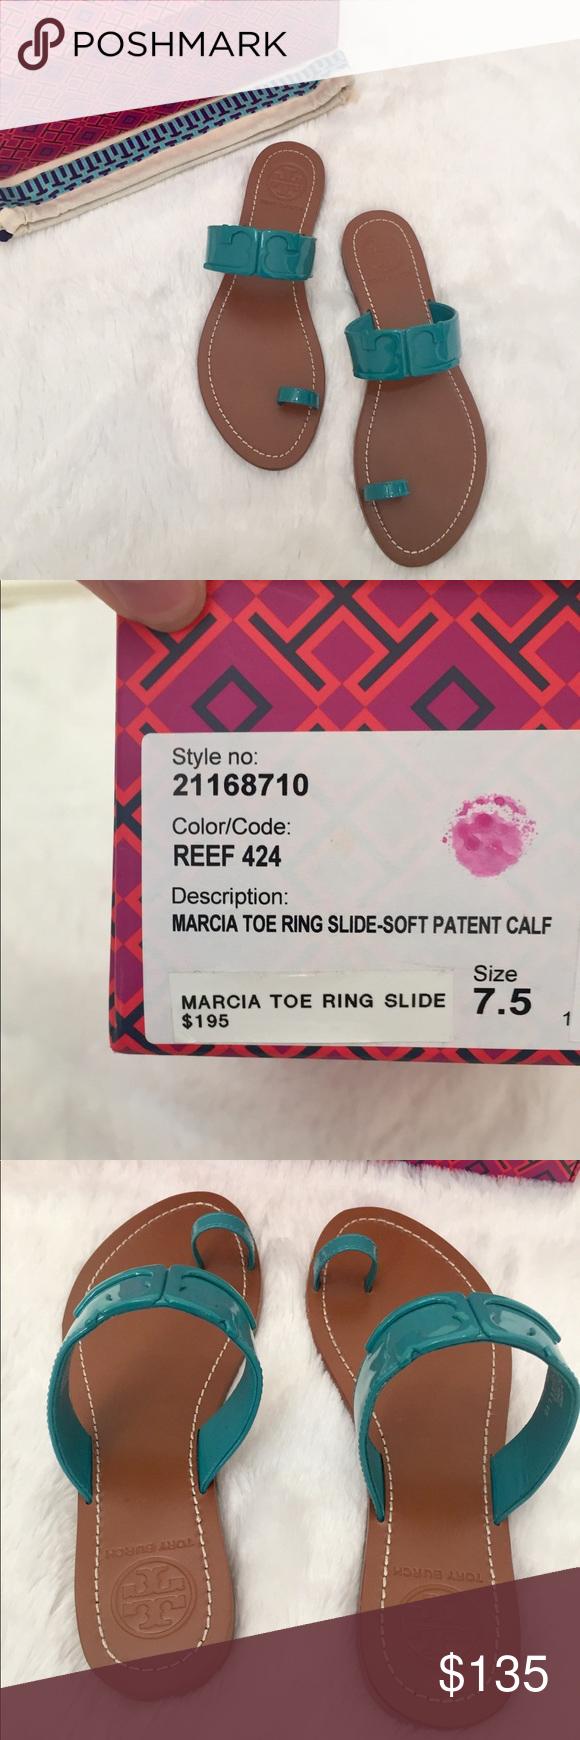 3dde3f5cb NWT✨Tory Burch Marcia Toe Ring Slides NWT